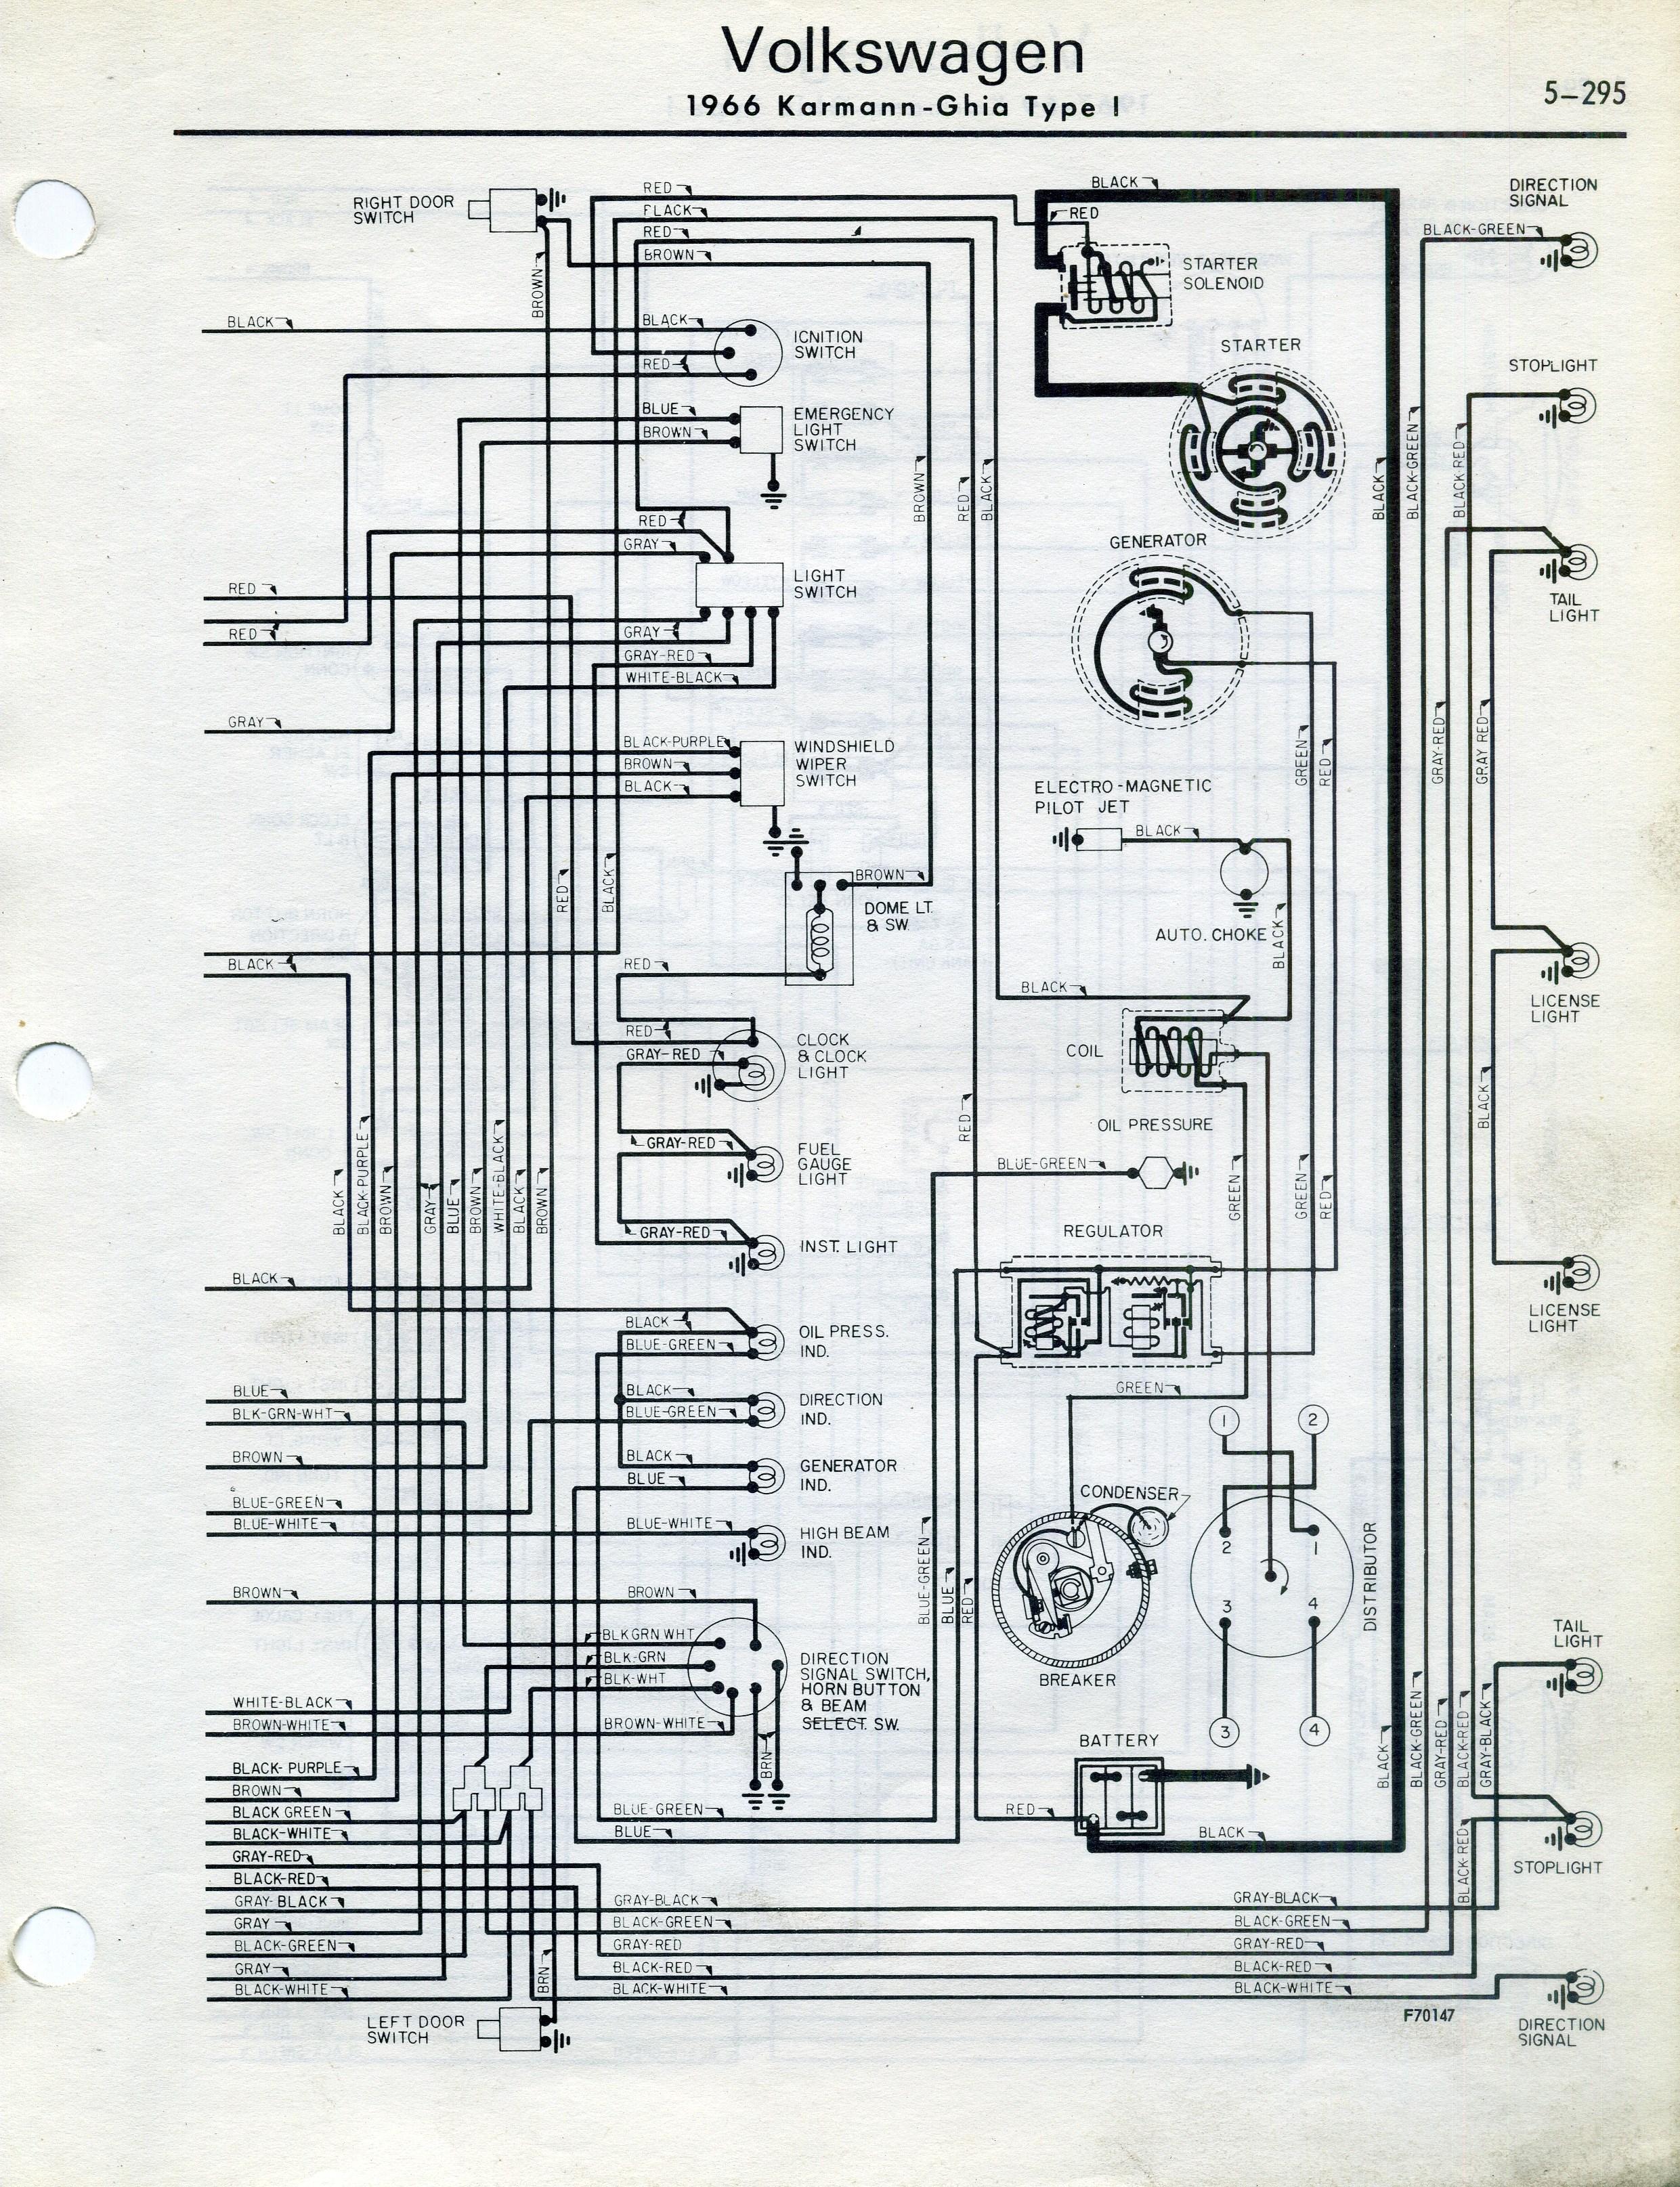 Yz 6370 Wiring Diagram Also 1971 Karmann Ghia Wiring Diagram Further Chevy Download Diagram